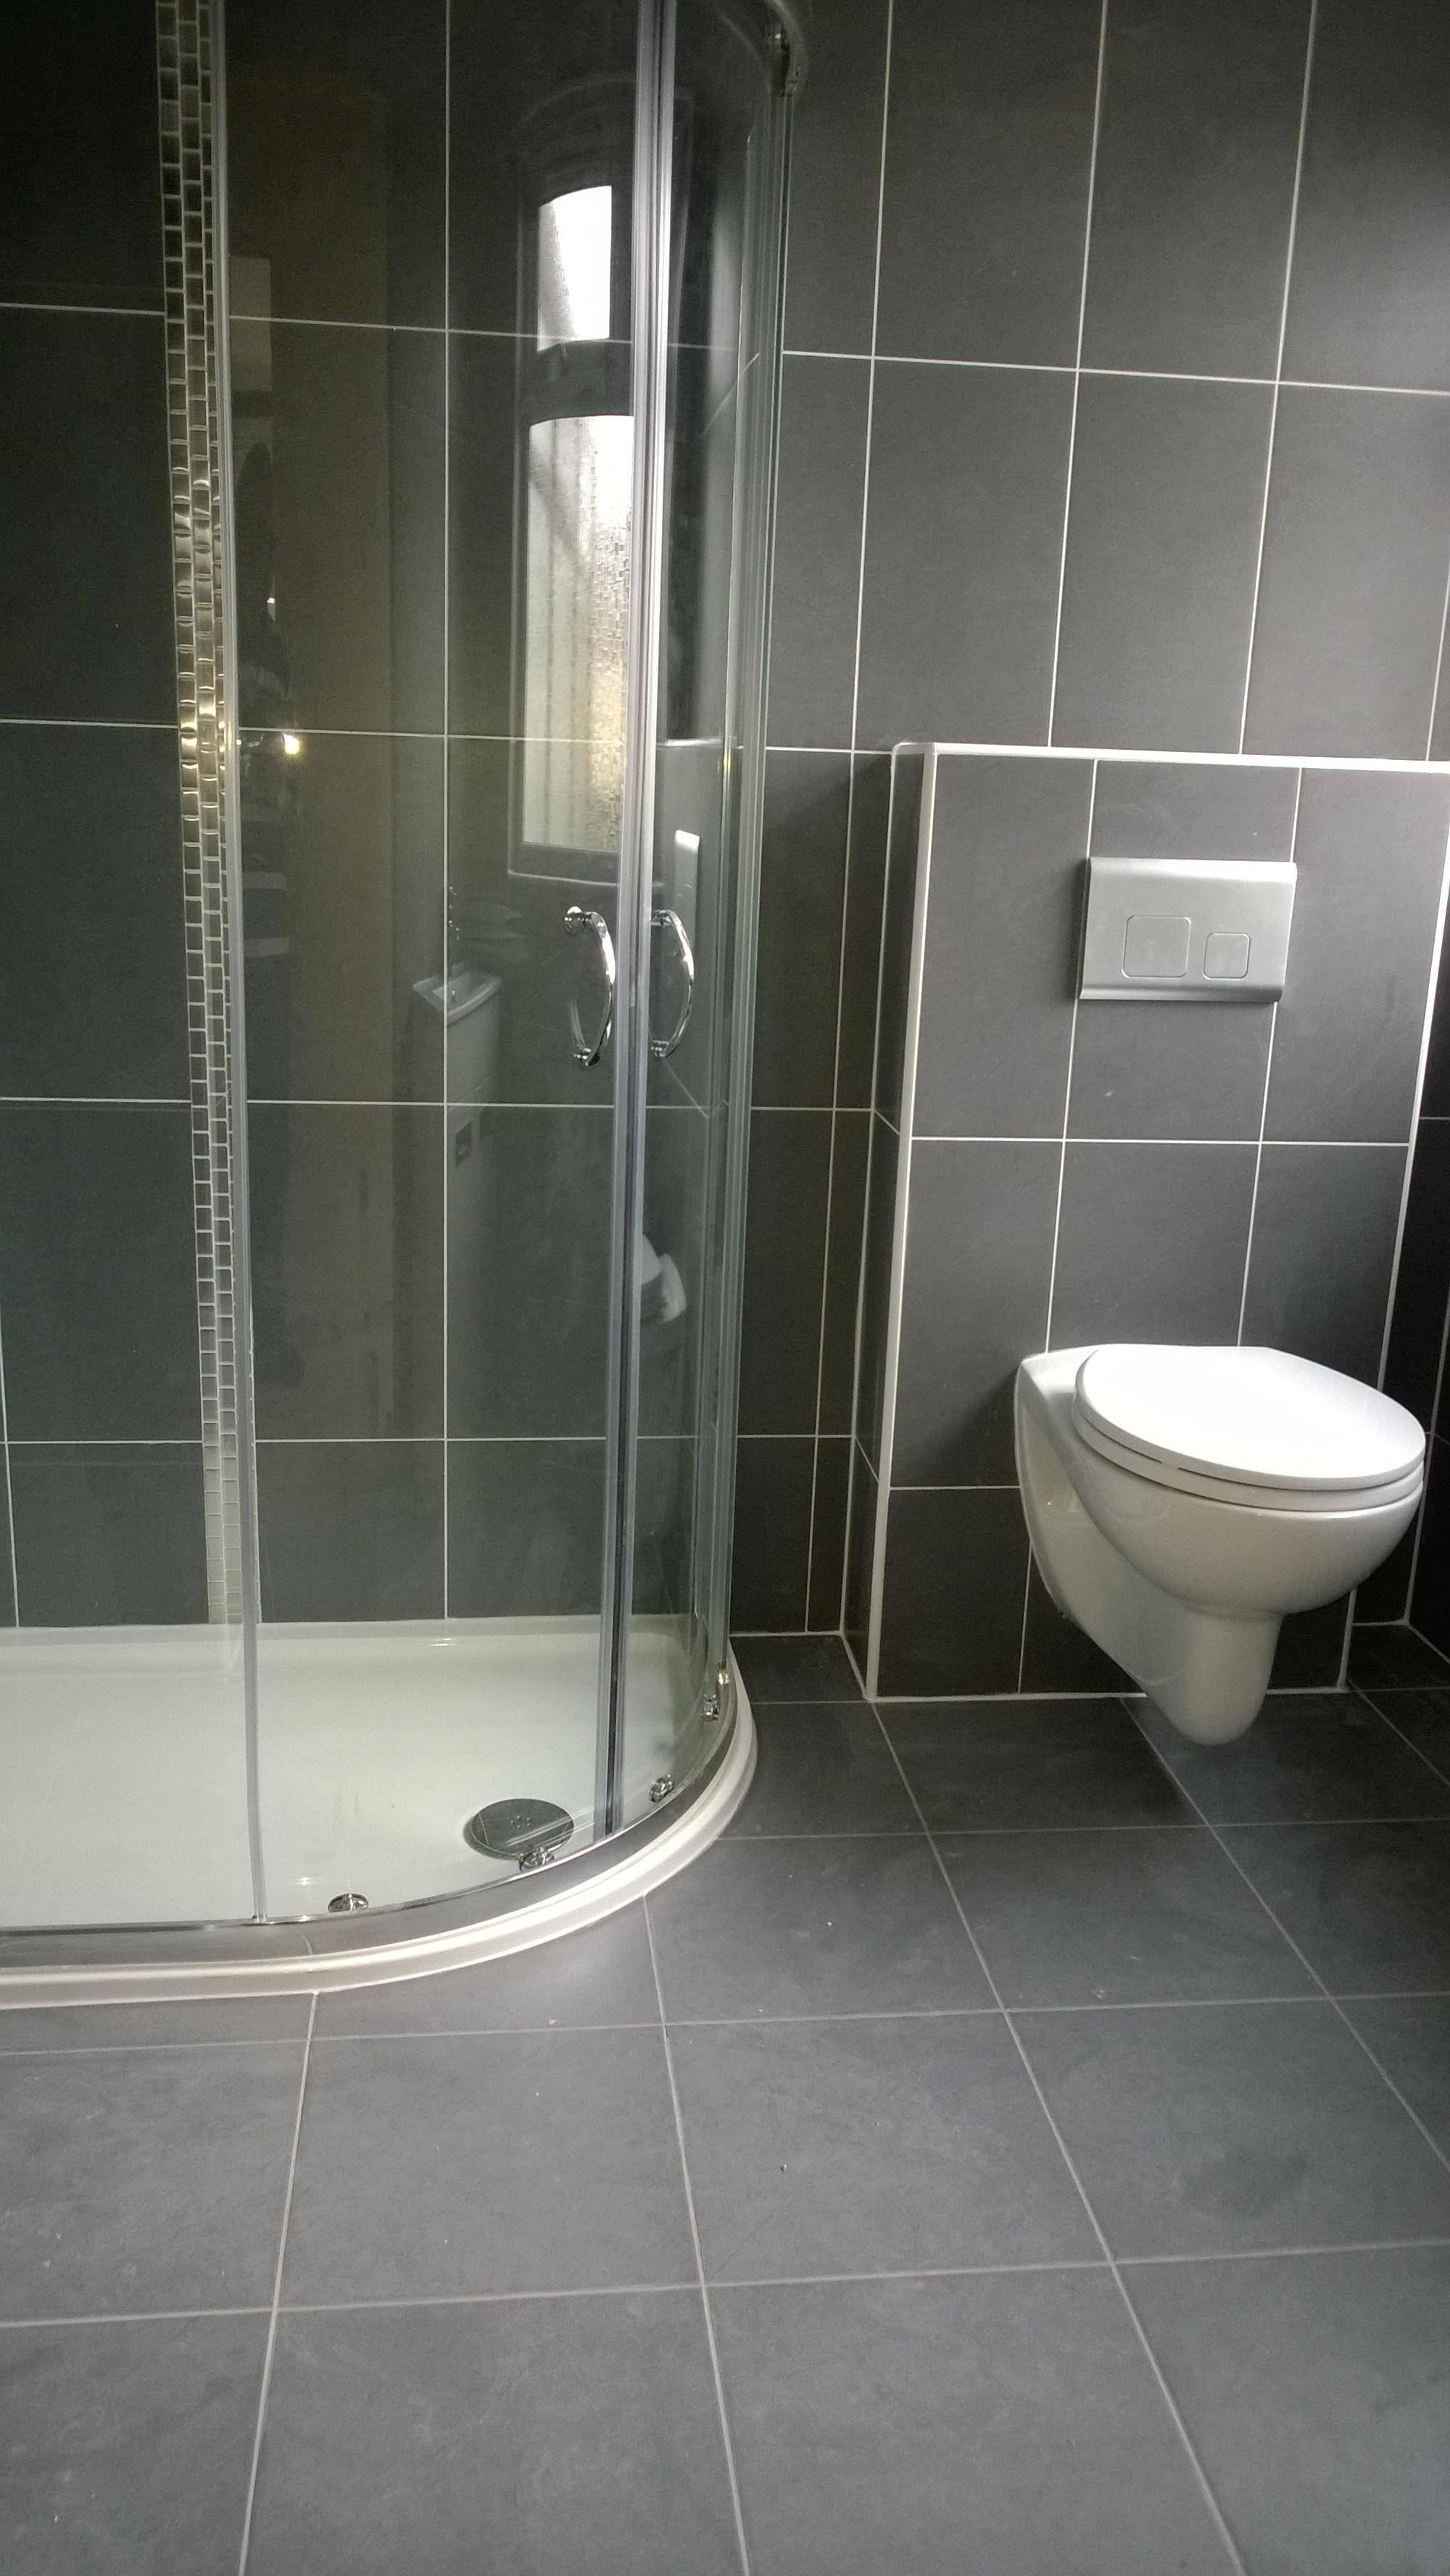 Bathrooms Latest photo